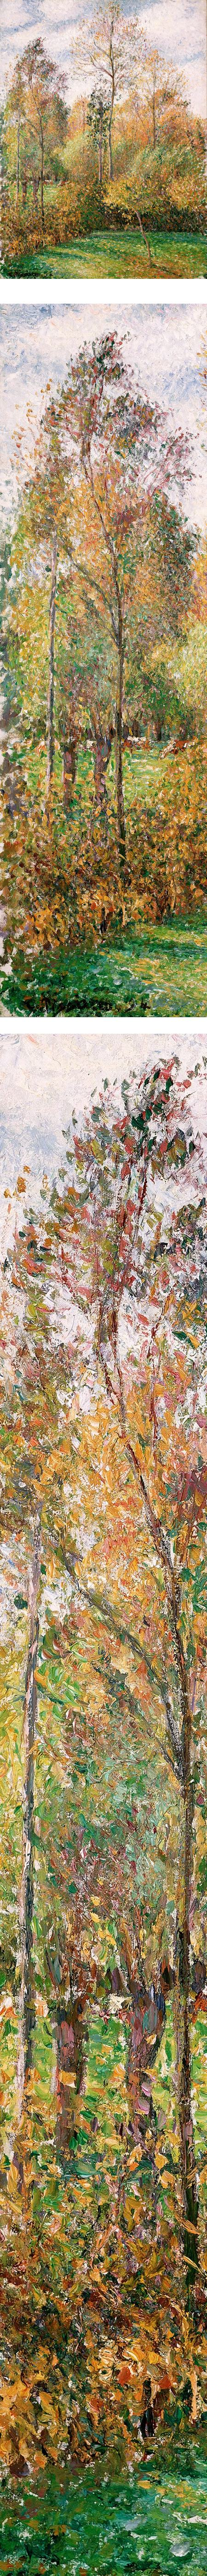 Autumn, Poplars, &Eaute;ragny, Camille Pissarro